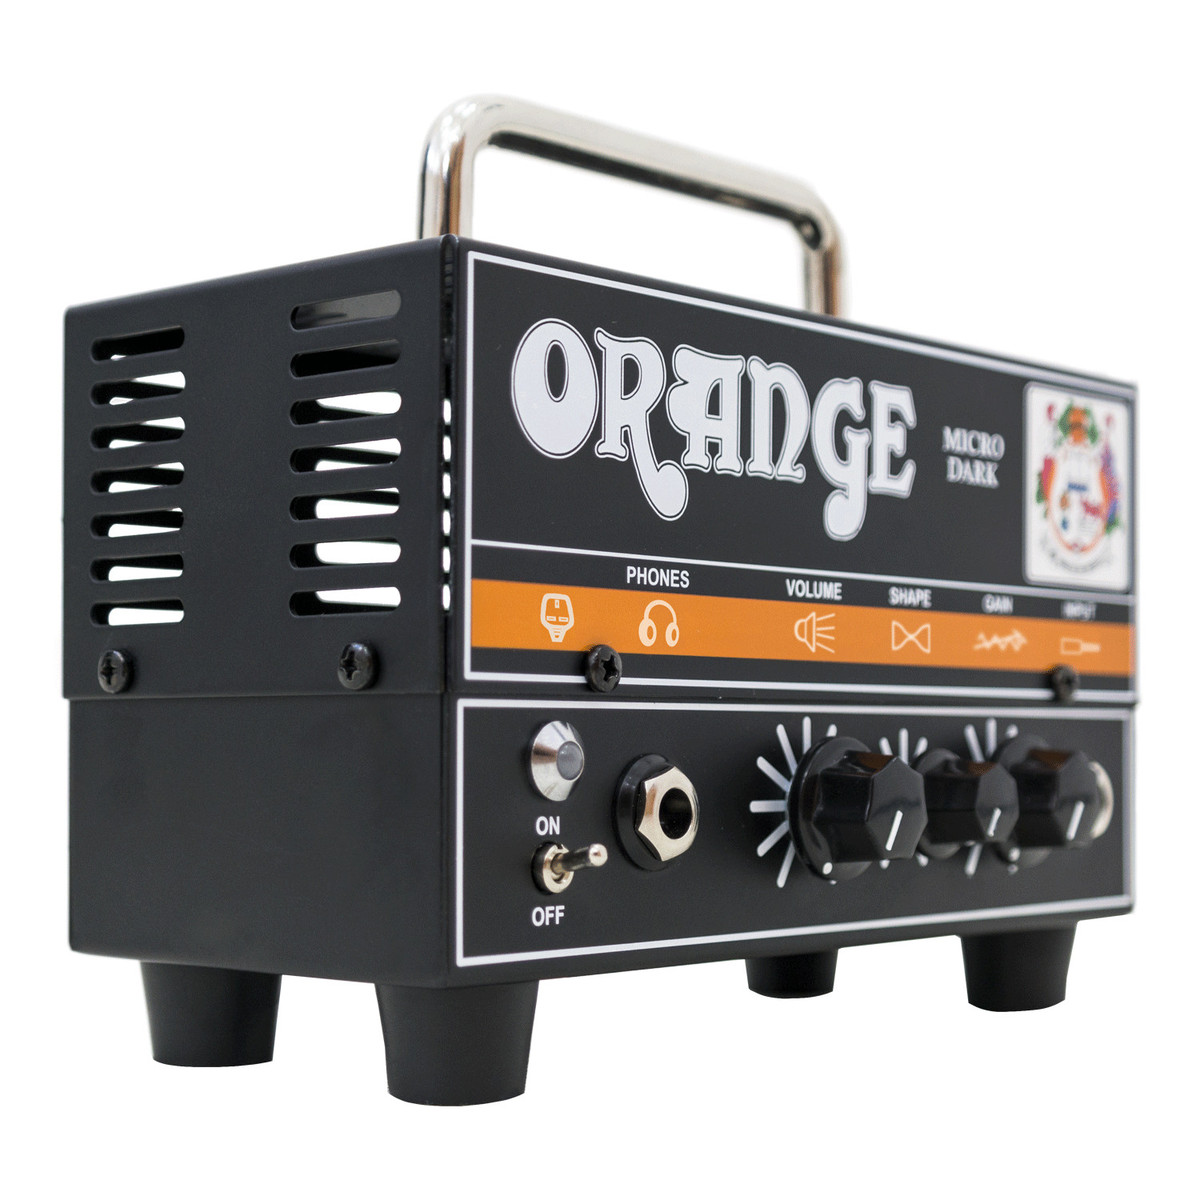 orange micro dark valve hybrid guitar amp head at. Black Bedroom Furniture Sets. Home Design Ideas